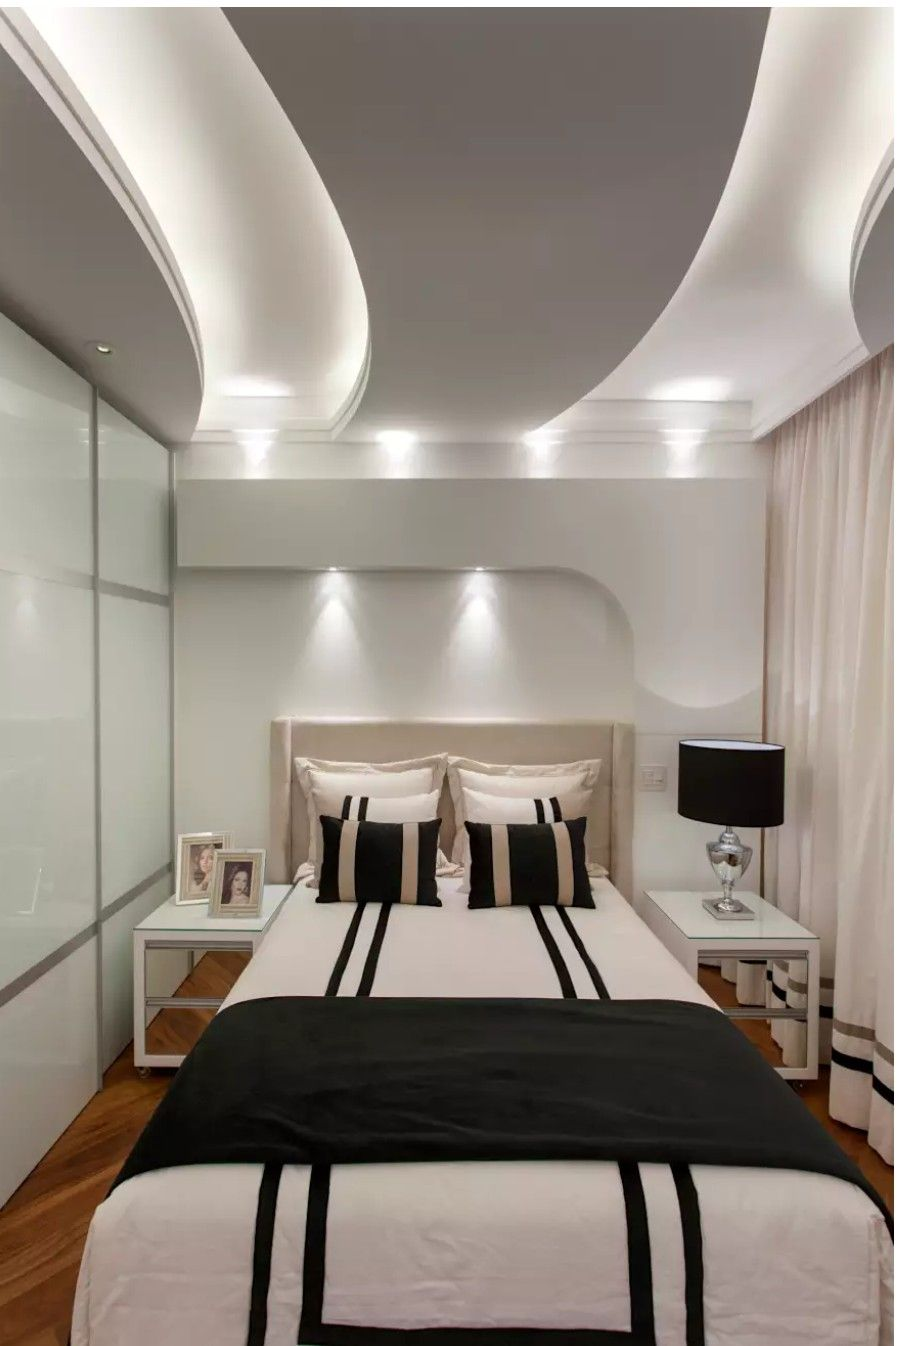 Small guestroom | False ceiling, Bedroom false ceiling ...